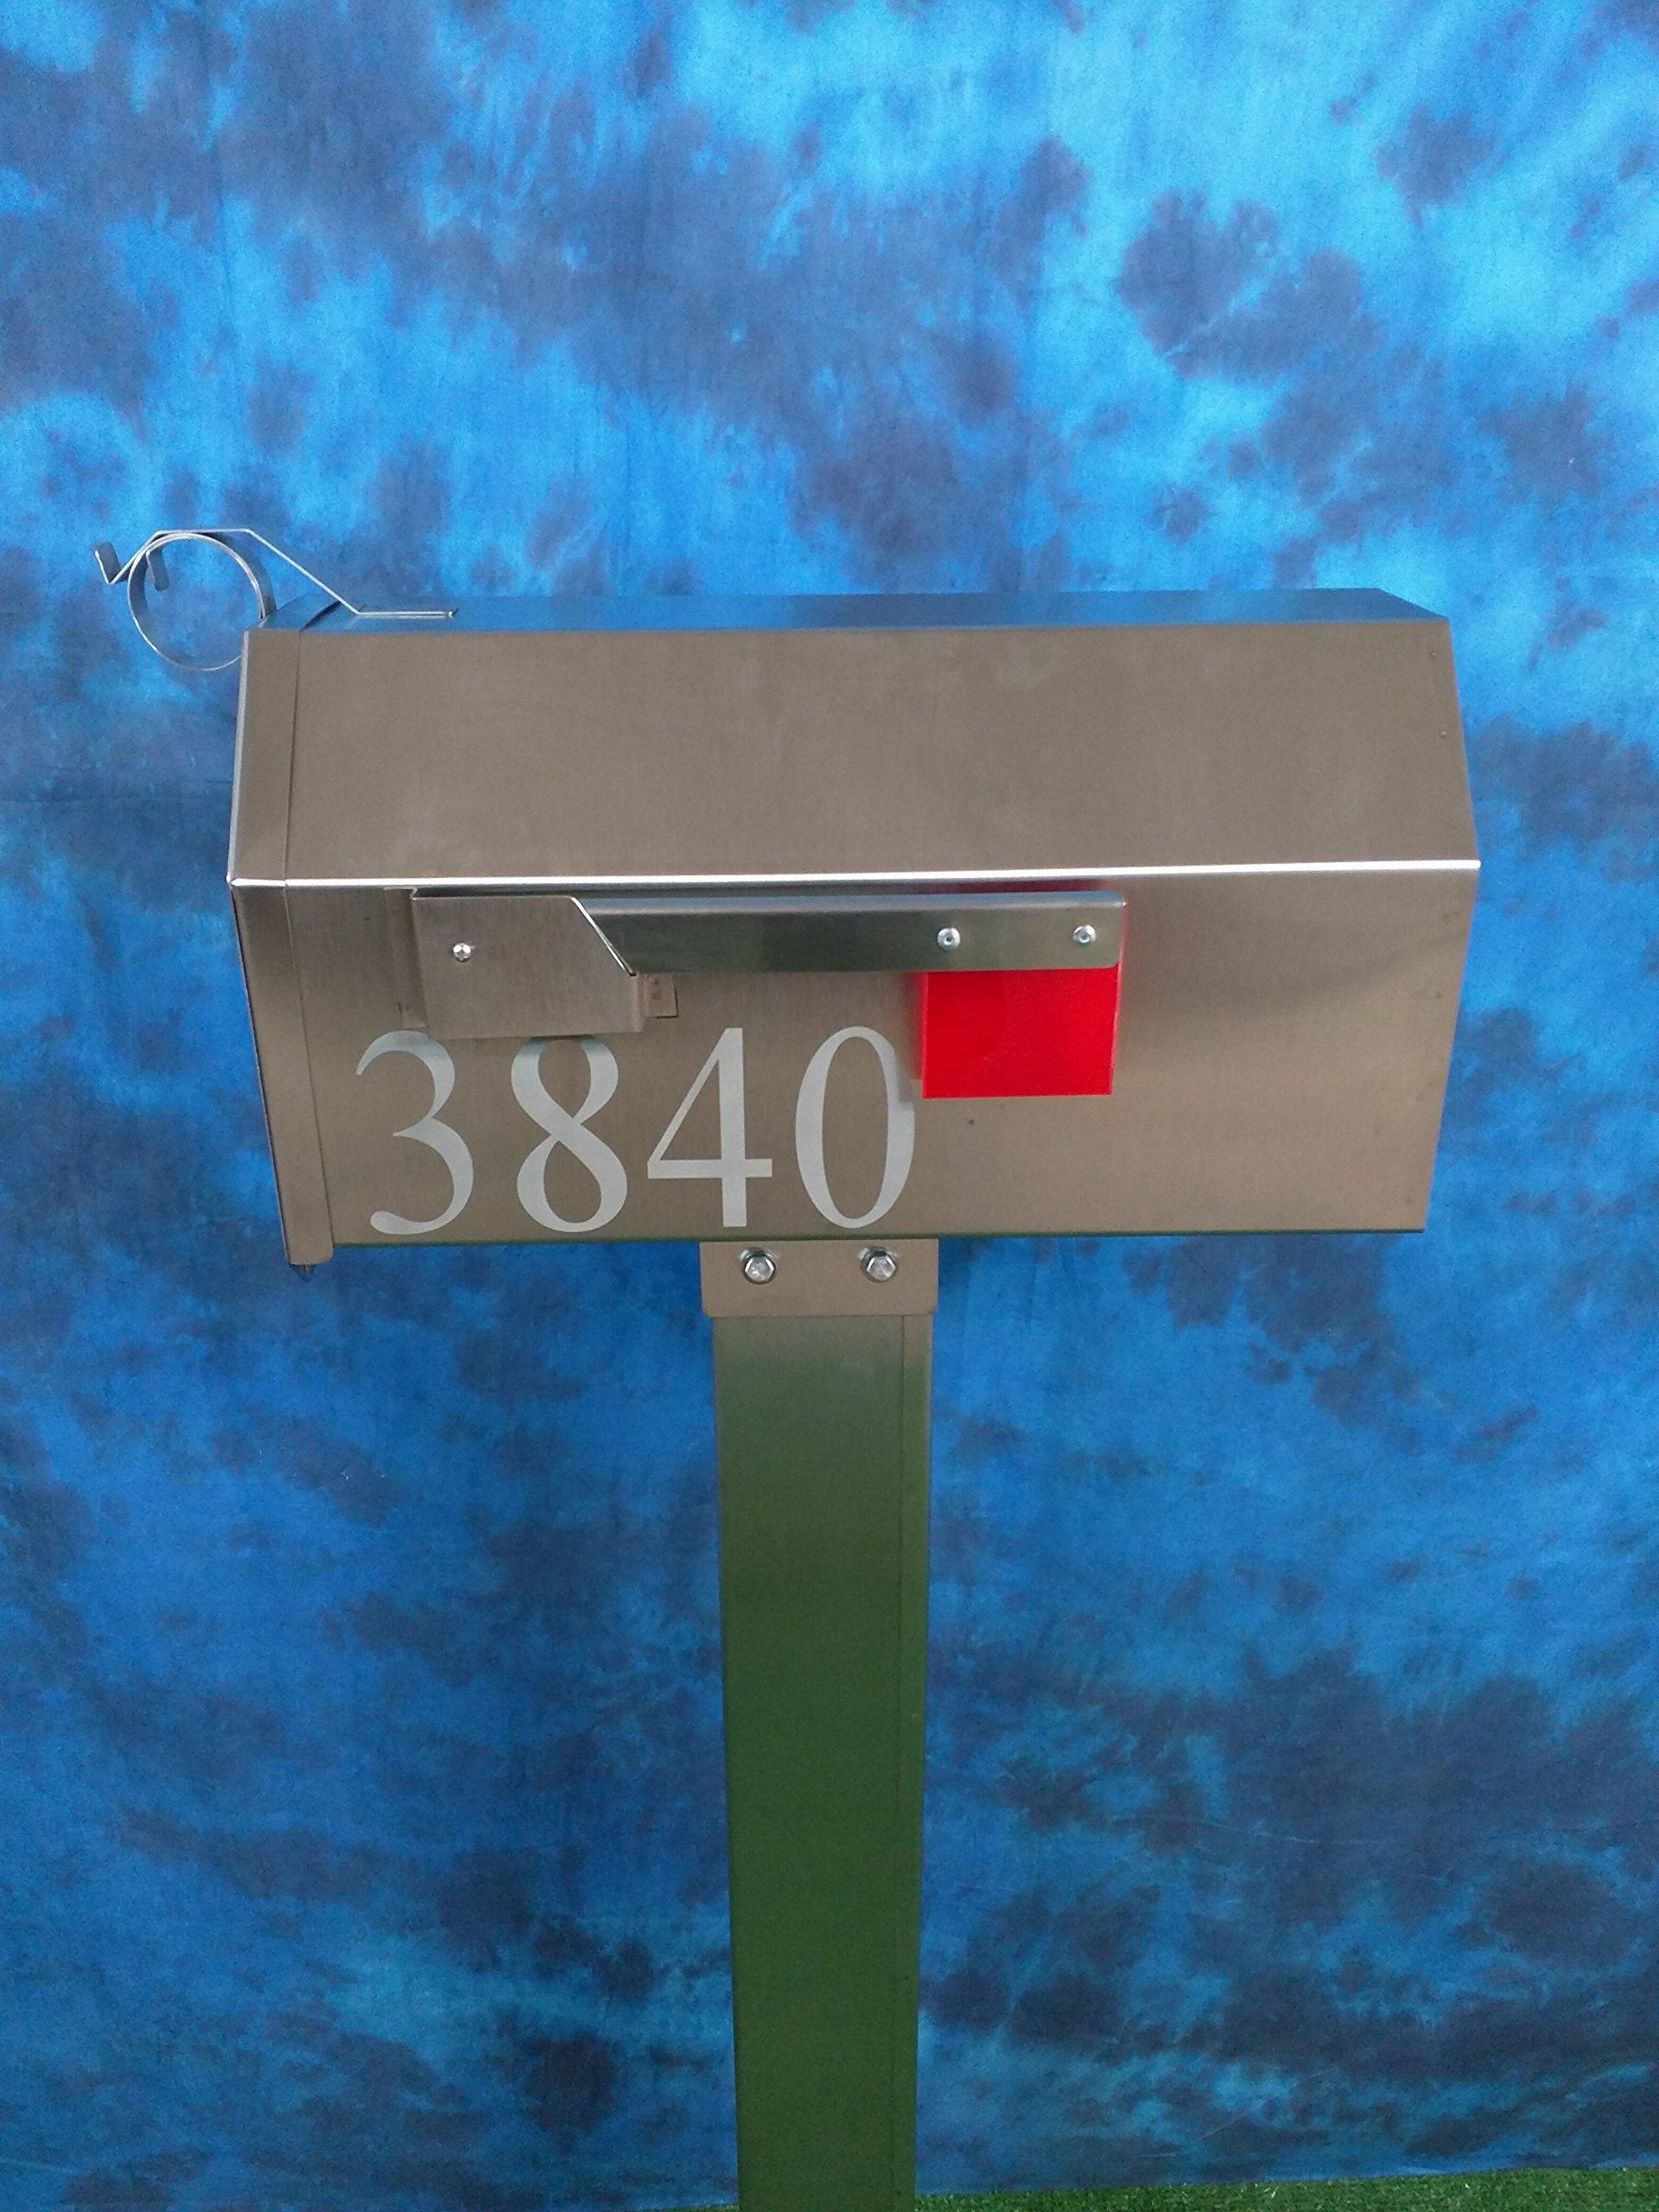 The Dutchbarn Handmade Stainless Steel Mailbox LARGE by Grandpas Stainless Workshop